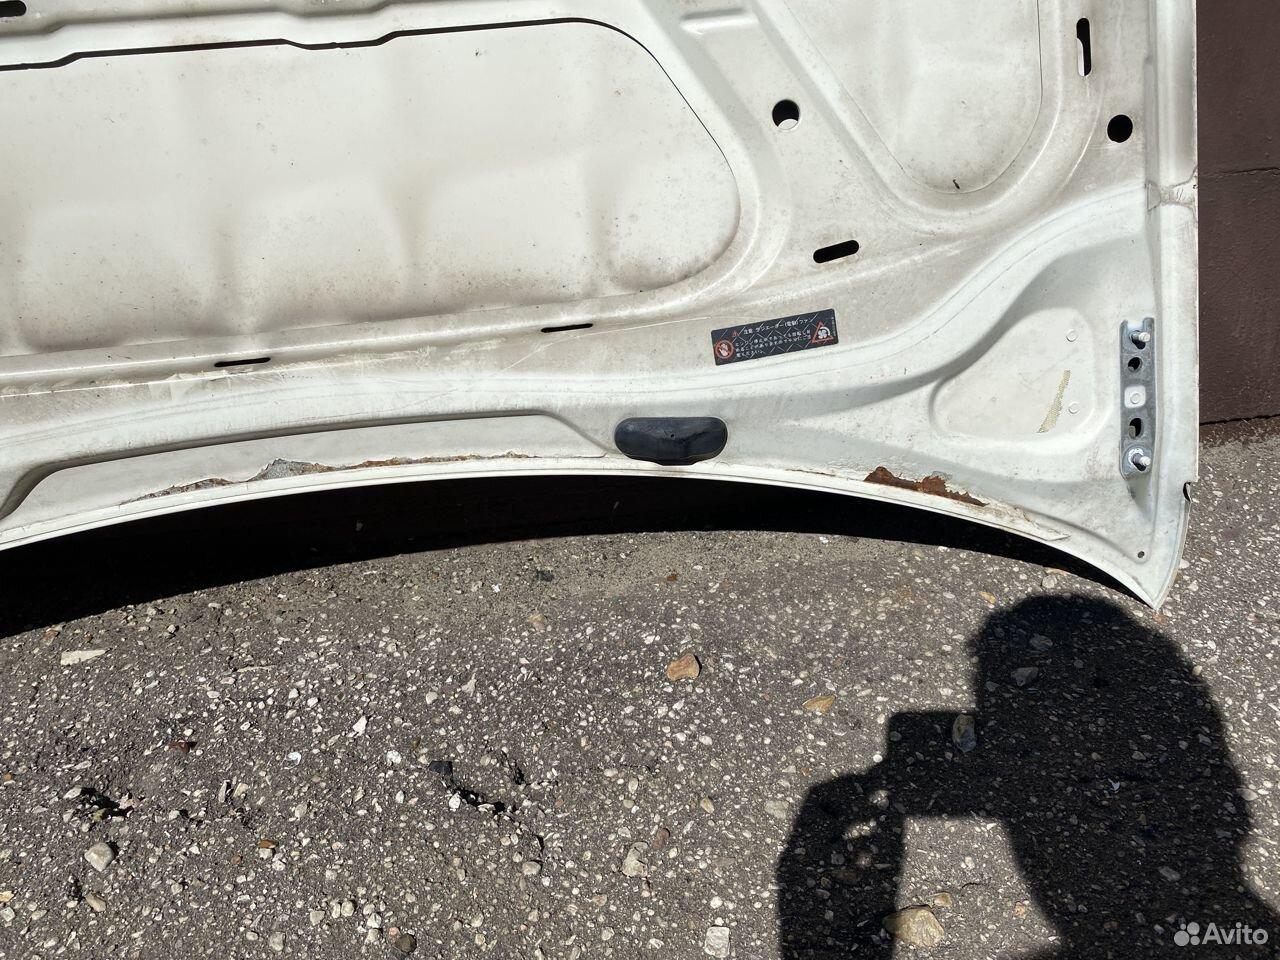 Капот белый Volkswagen Jetta 5, Golf 5 №2  89534684247 купить 5